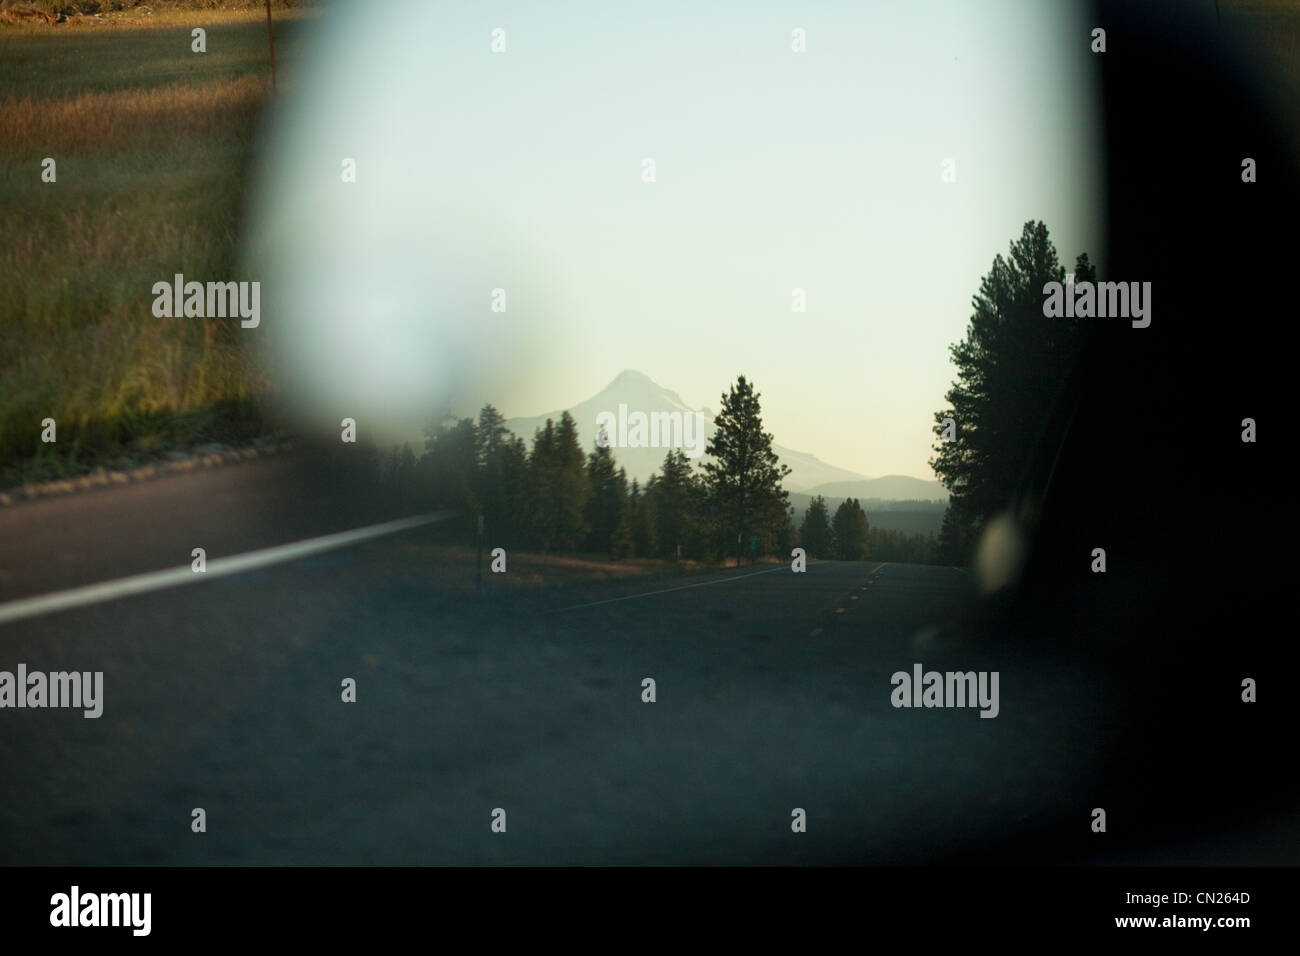 Mount Hood seen in car mirror, Portland, Oregon - Stock Image